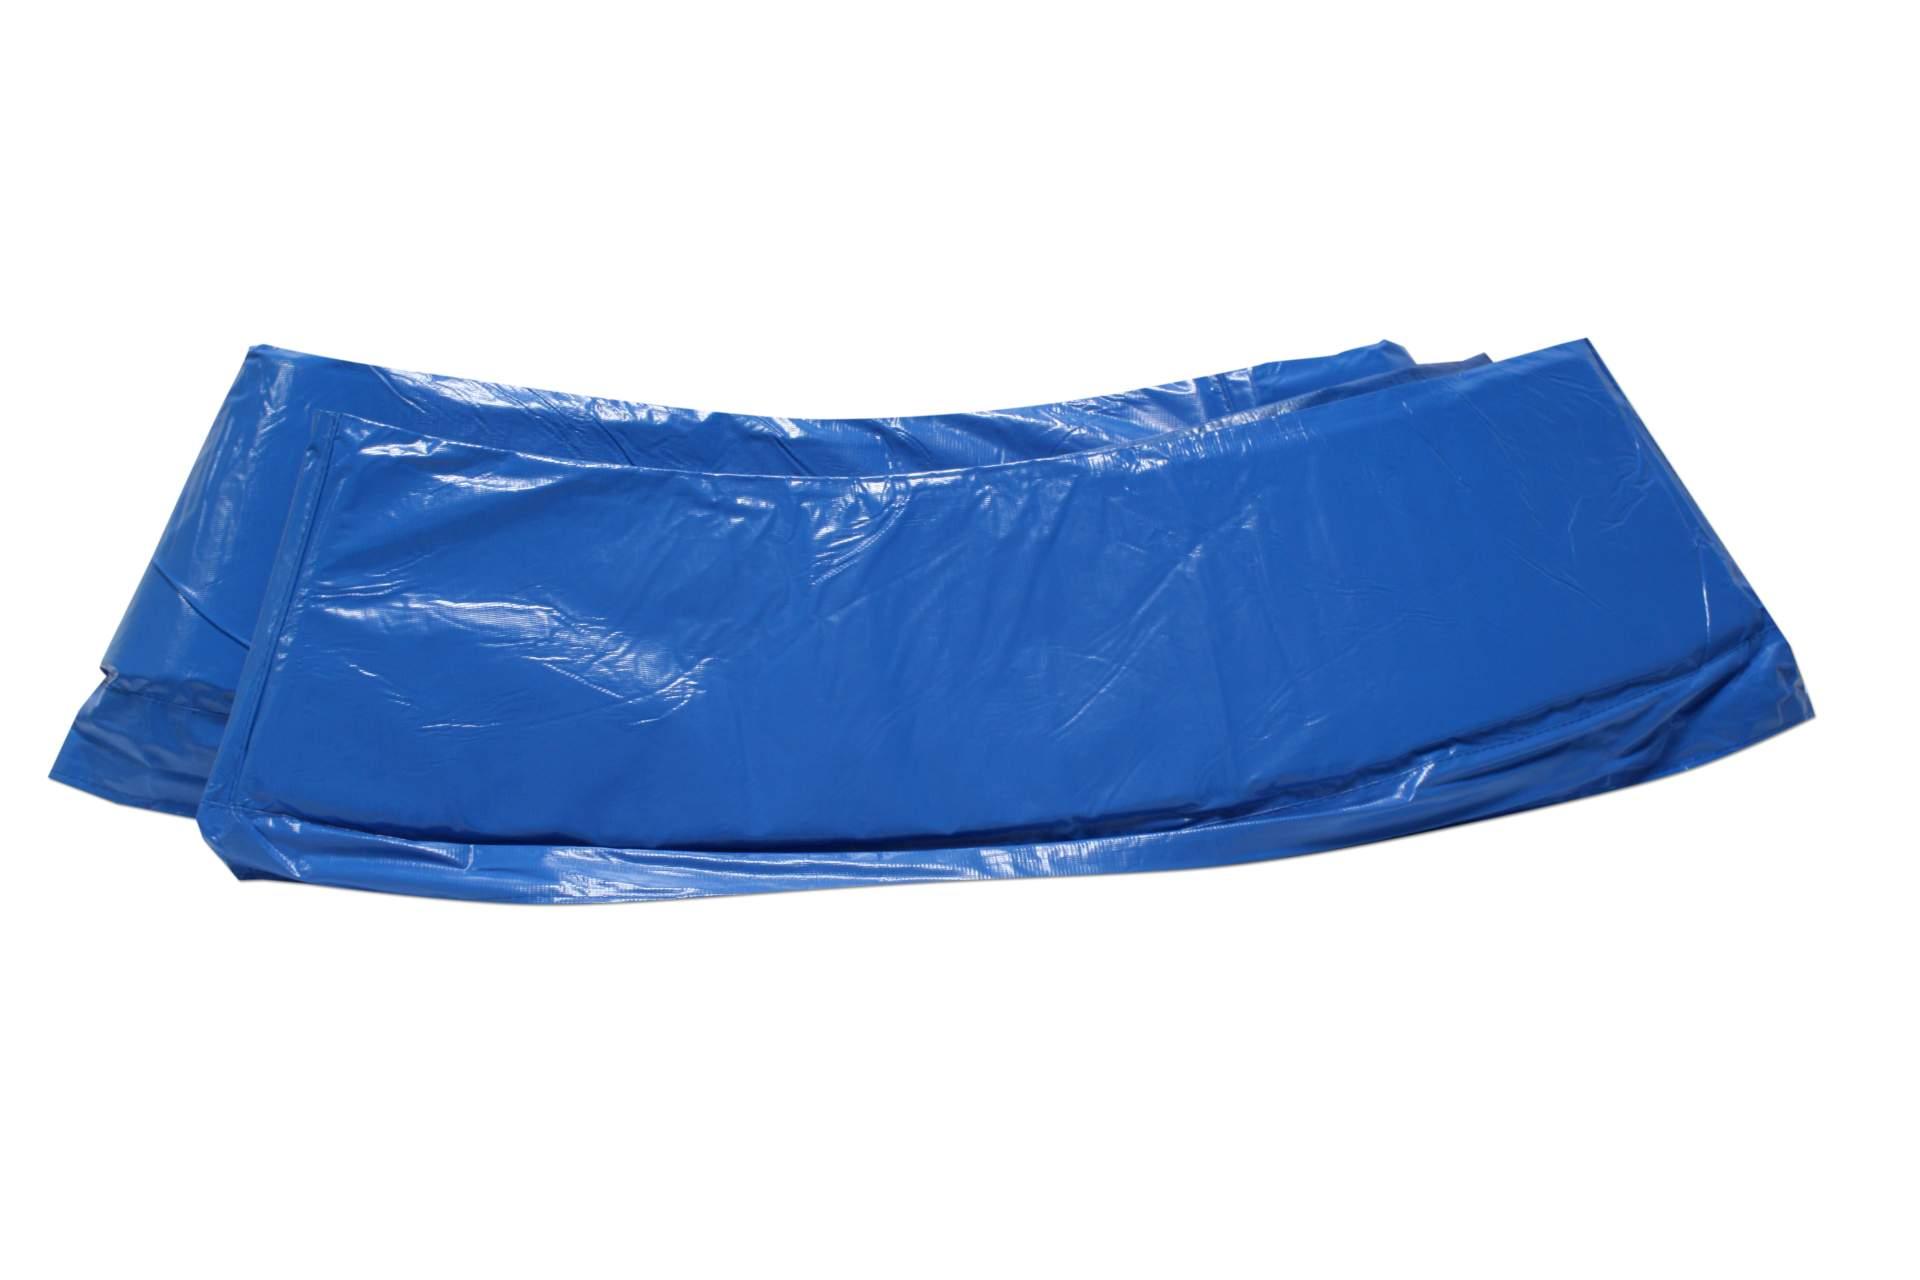 trampolin randabdeckung 305 cm feder abdeckung blau 10 ft. Black Bedroom Furniture Sets. Home Design Ideas